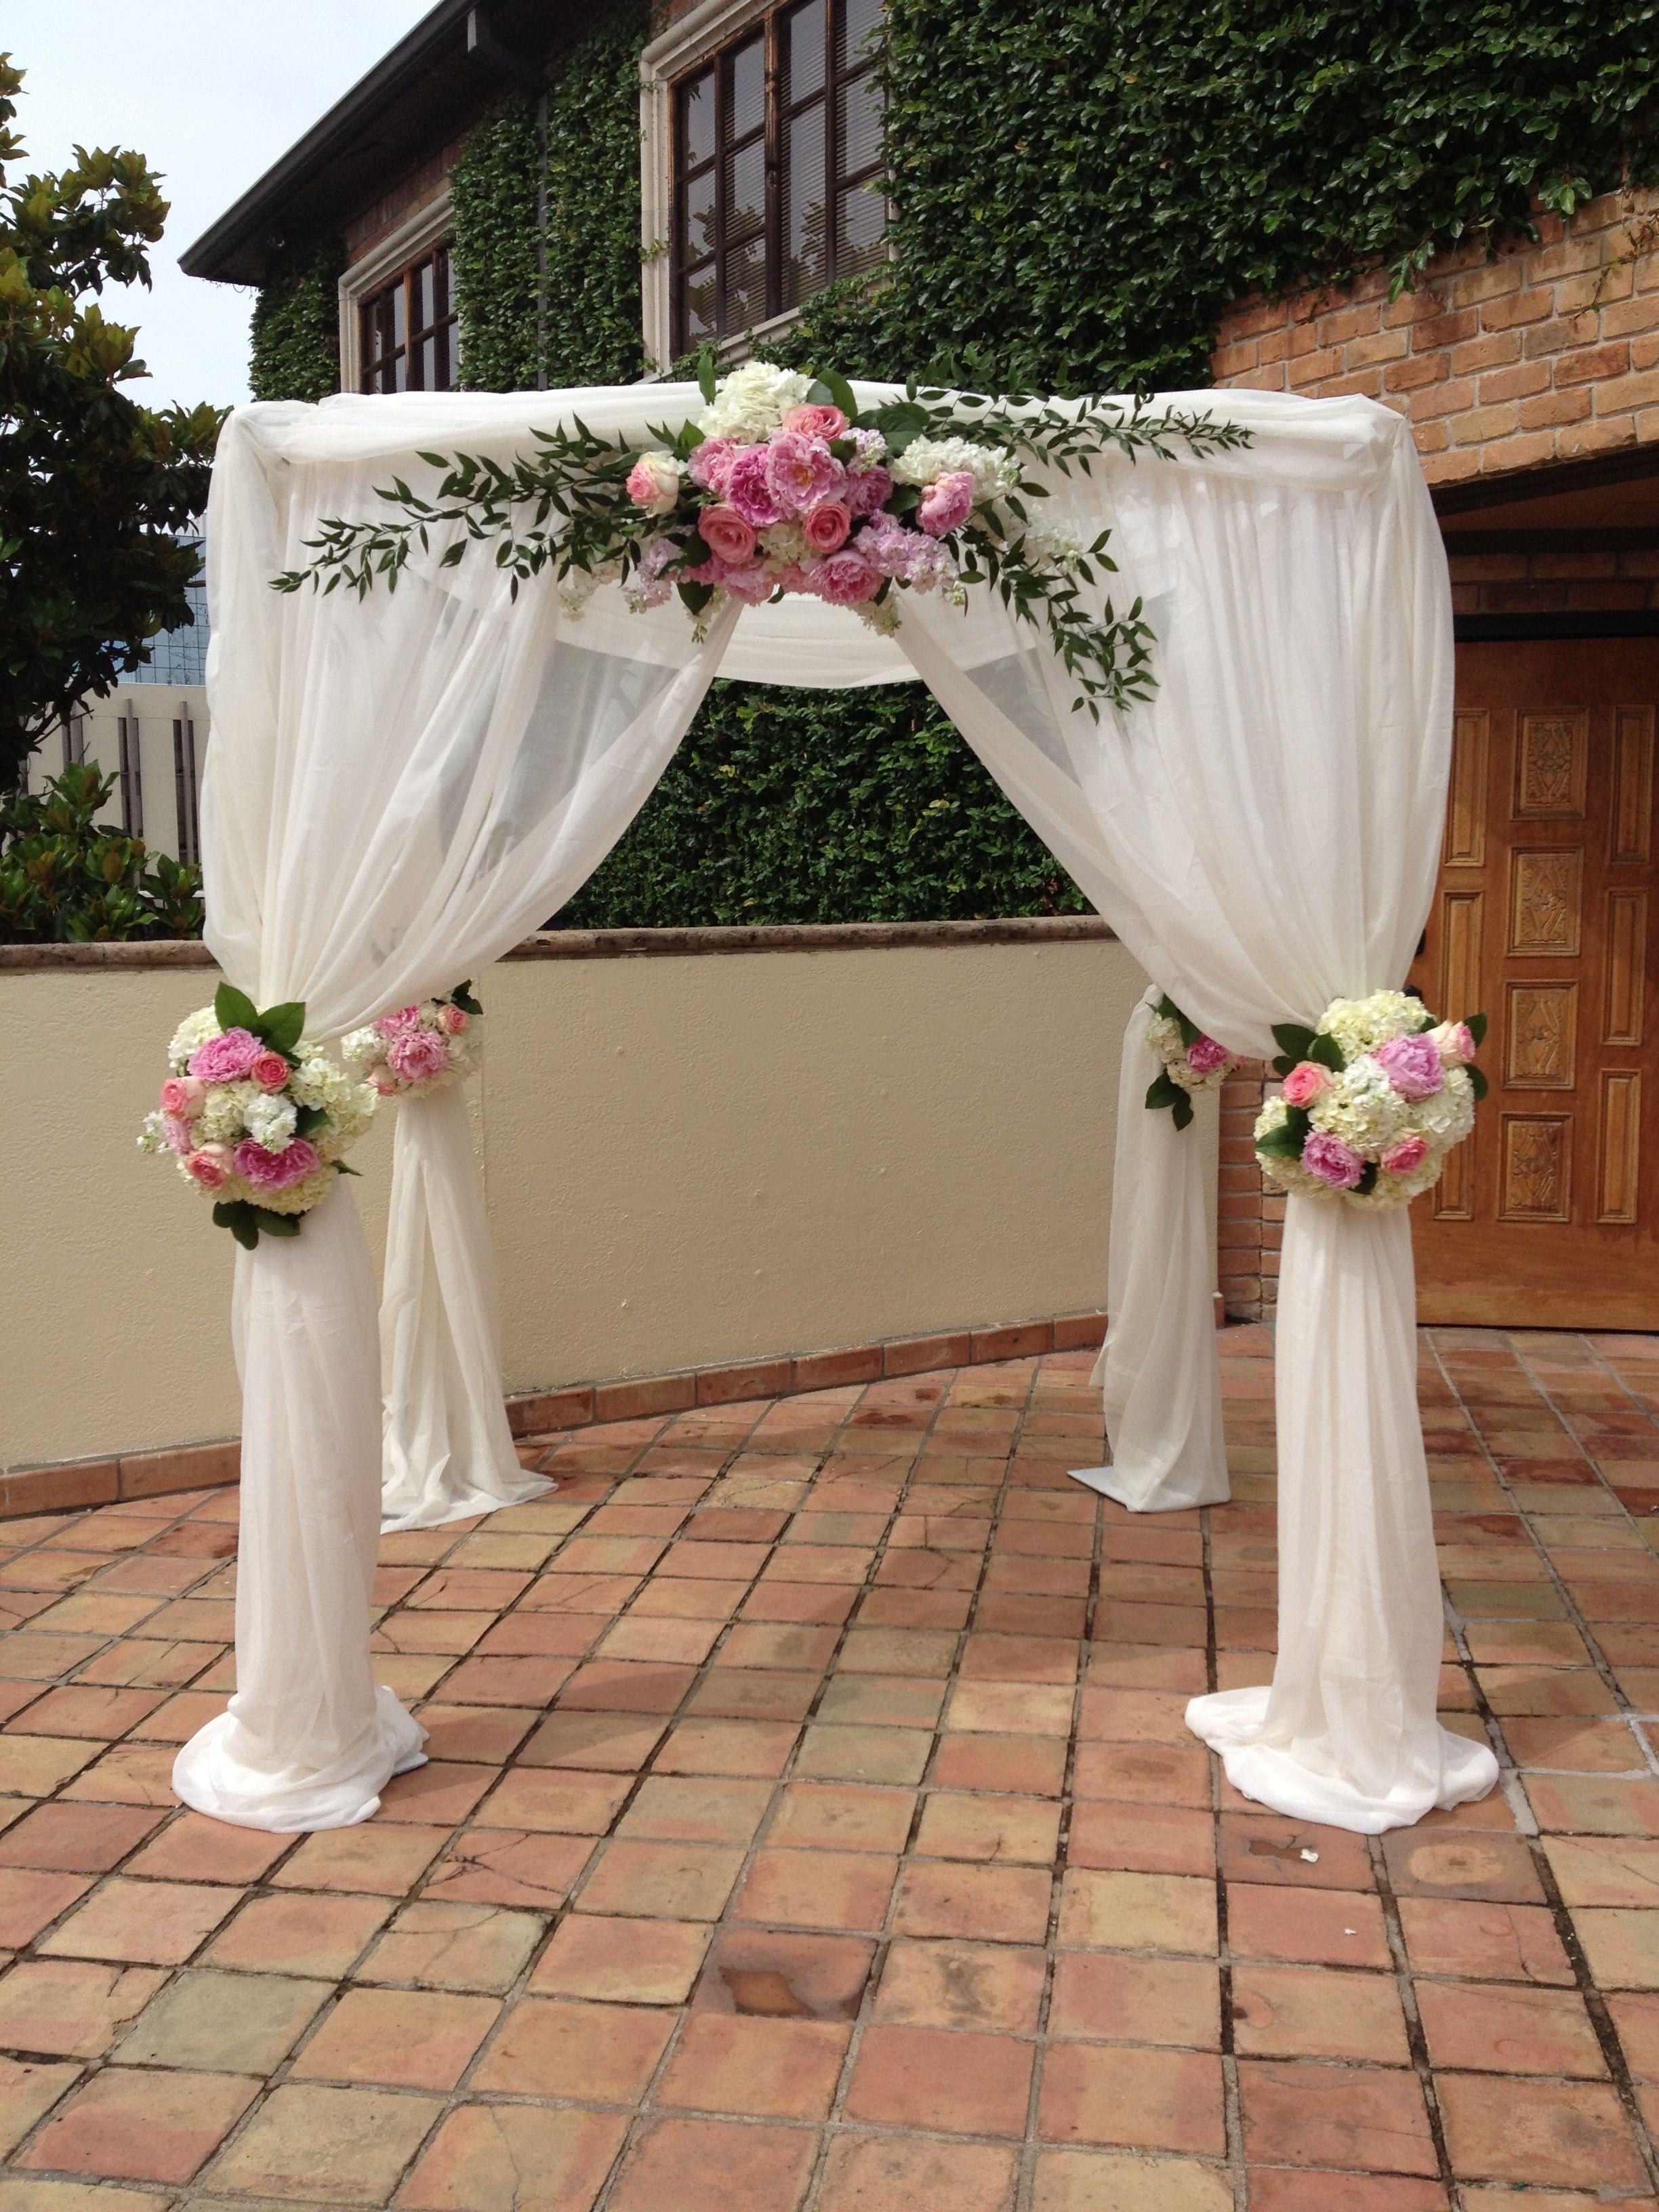 Wedding Gazebo - over sweetheart table at reception? | Wedding ...